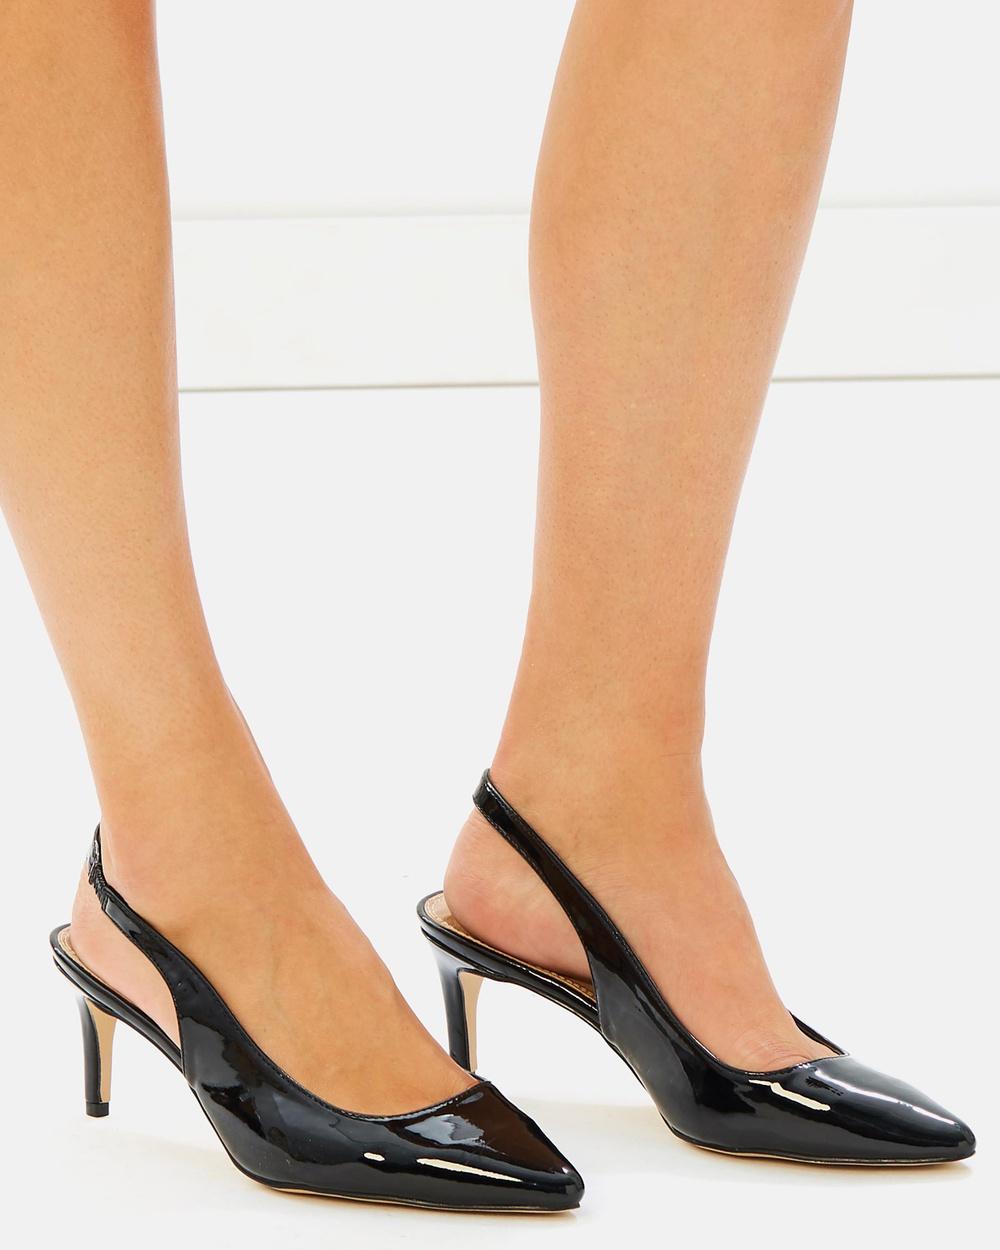 SPURR ICONIC EXCLUSIVE Osaka Sling back Heels All Pumps Black Patent ICONIC EXCLUSIVE Osaka Sling back Heels